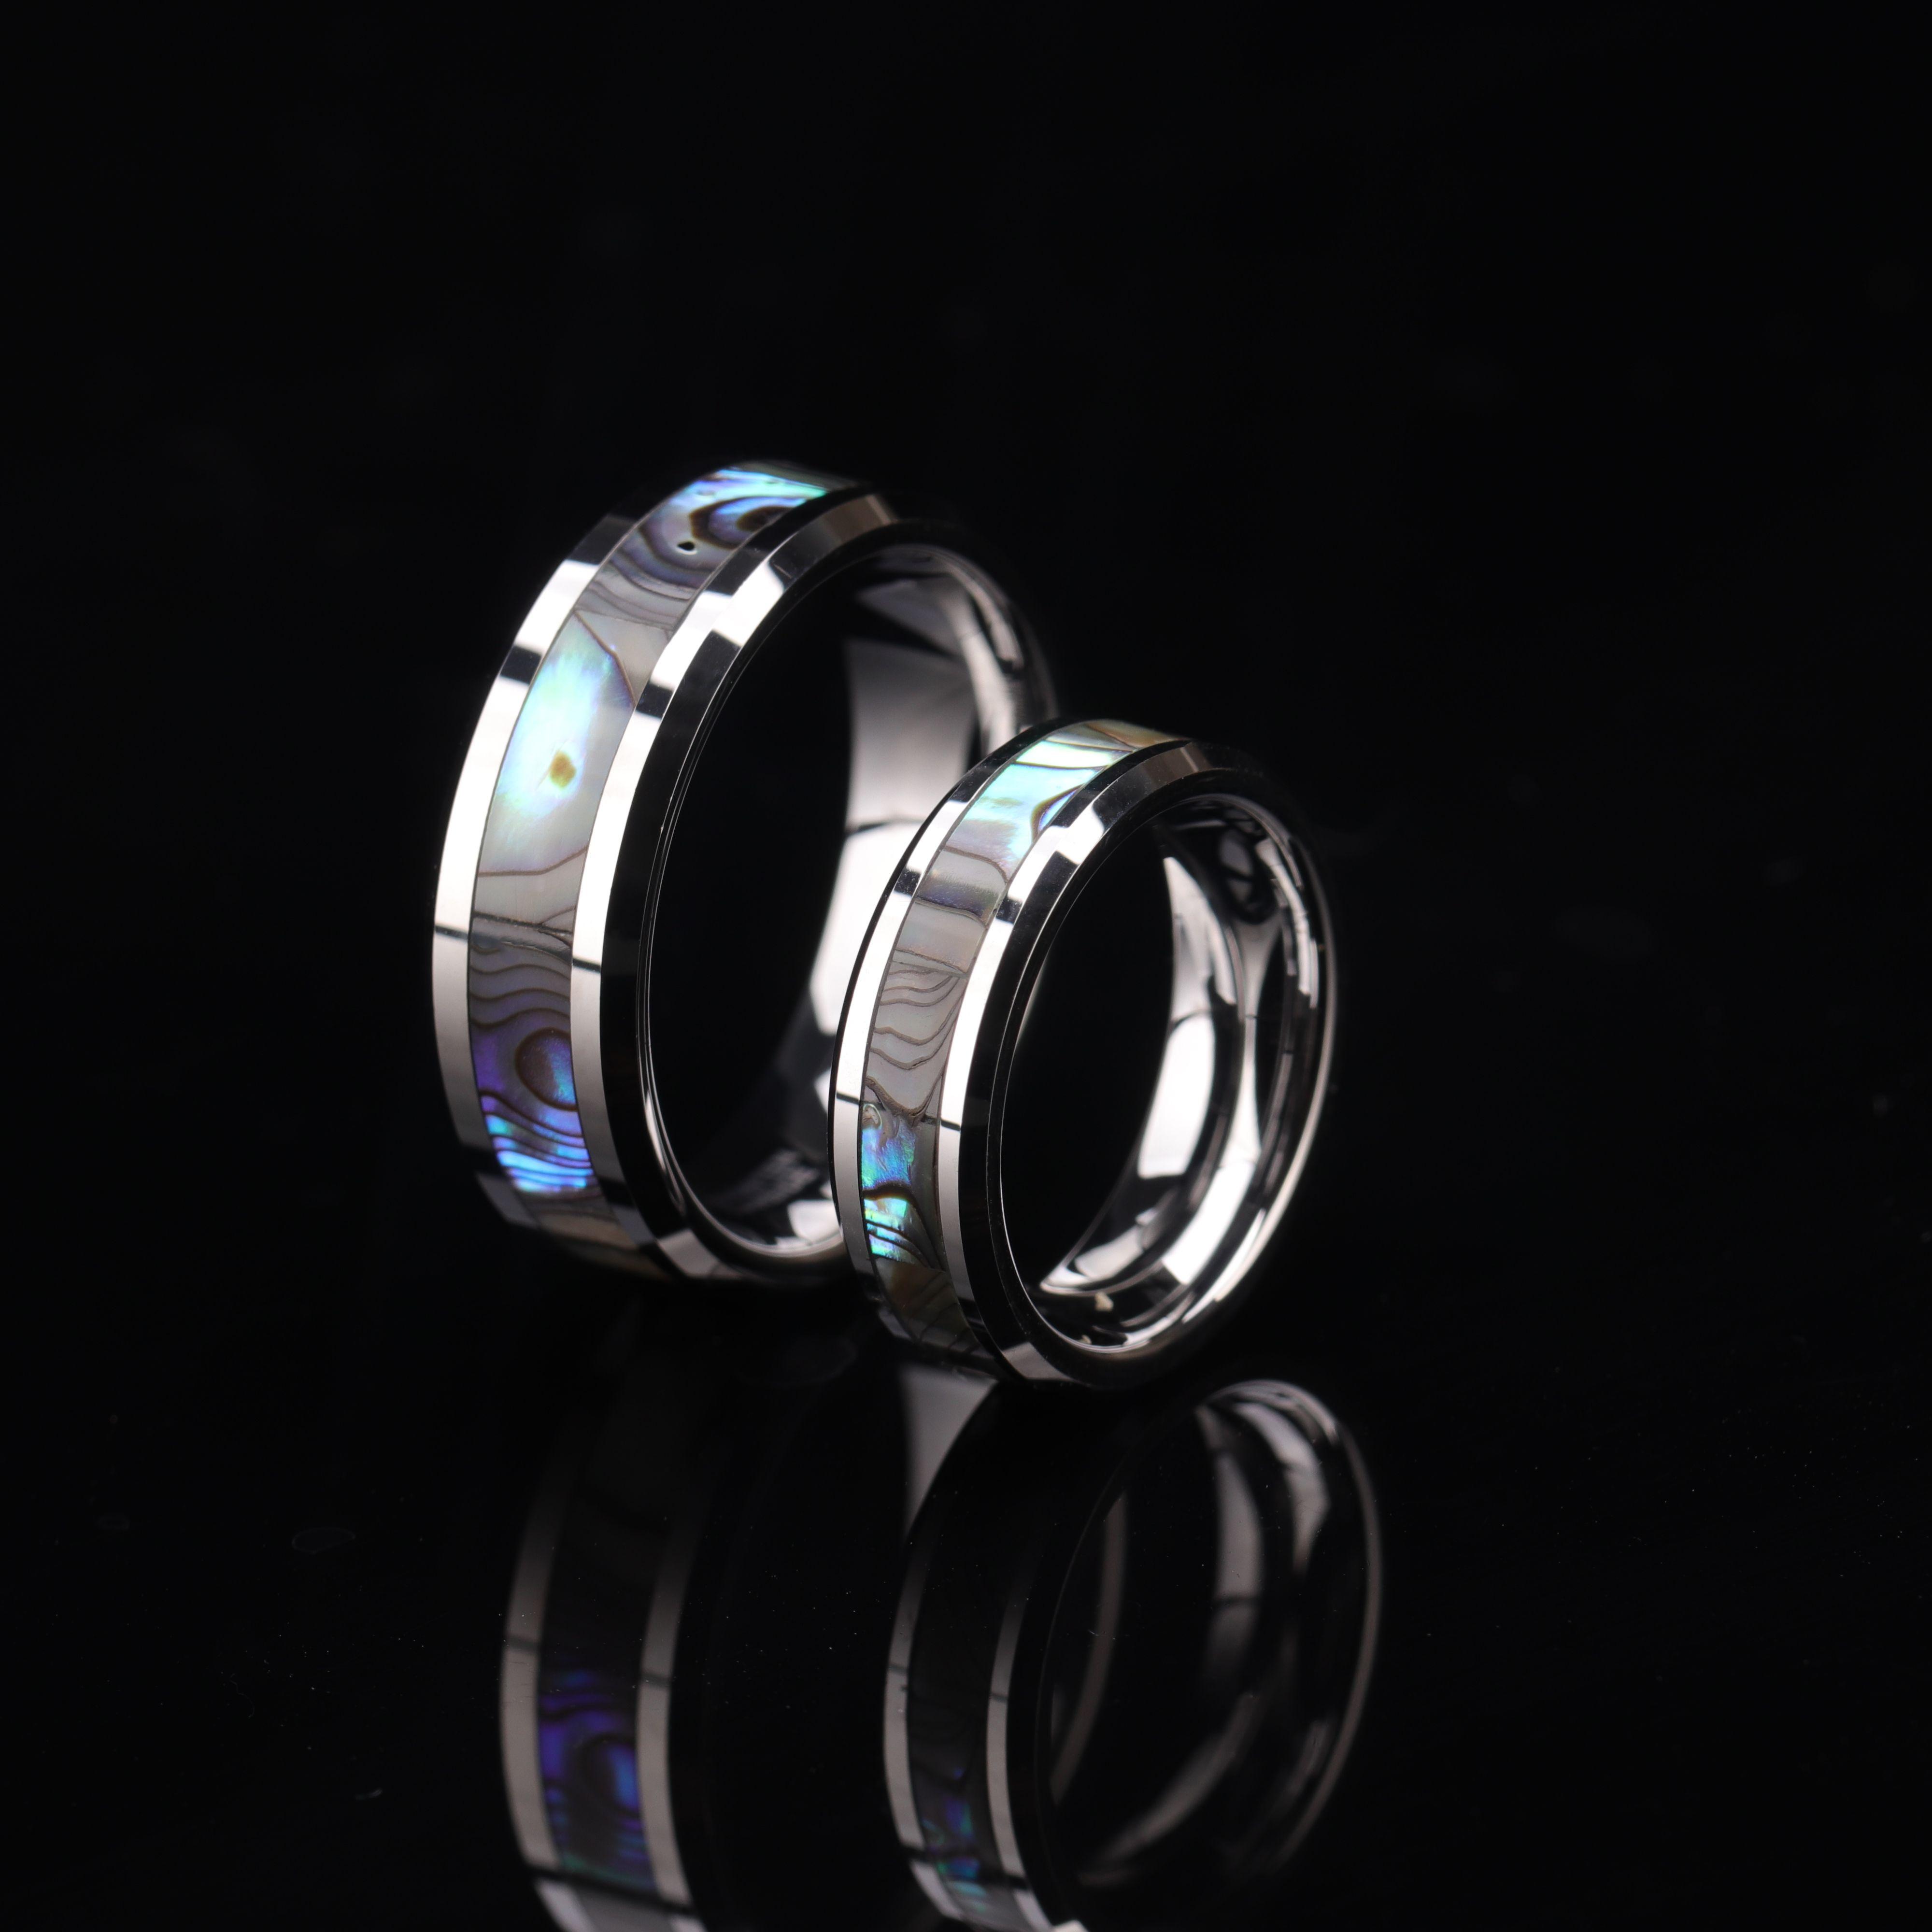 Ring Partner rings Engagement rings Wedding ring with titanium  carbon diamond